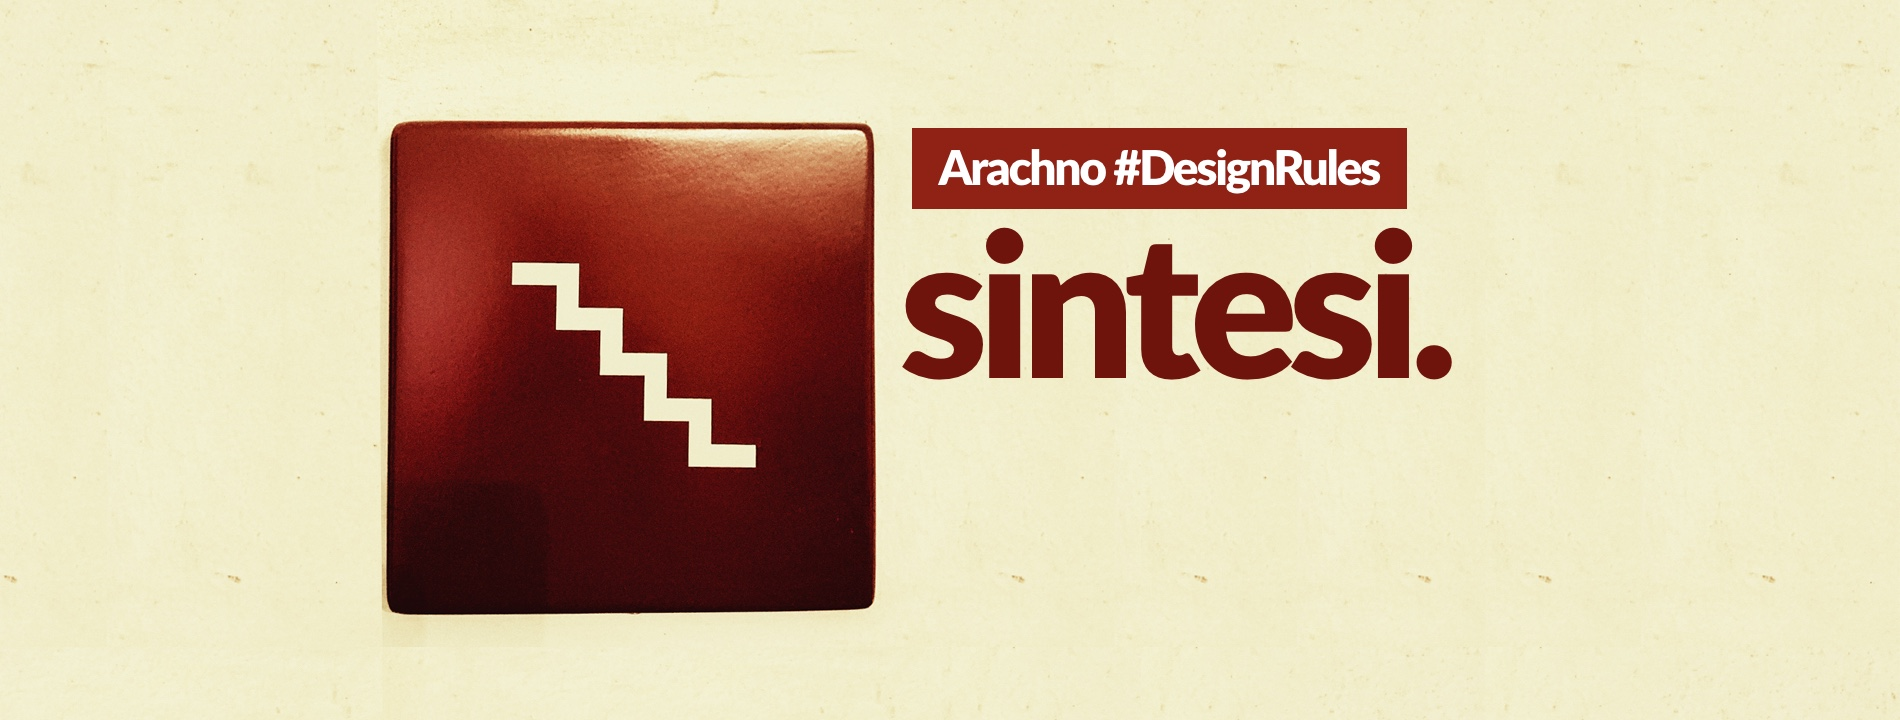 Arachno #DesignRules 02 - la sintesi